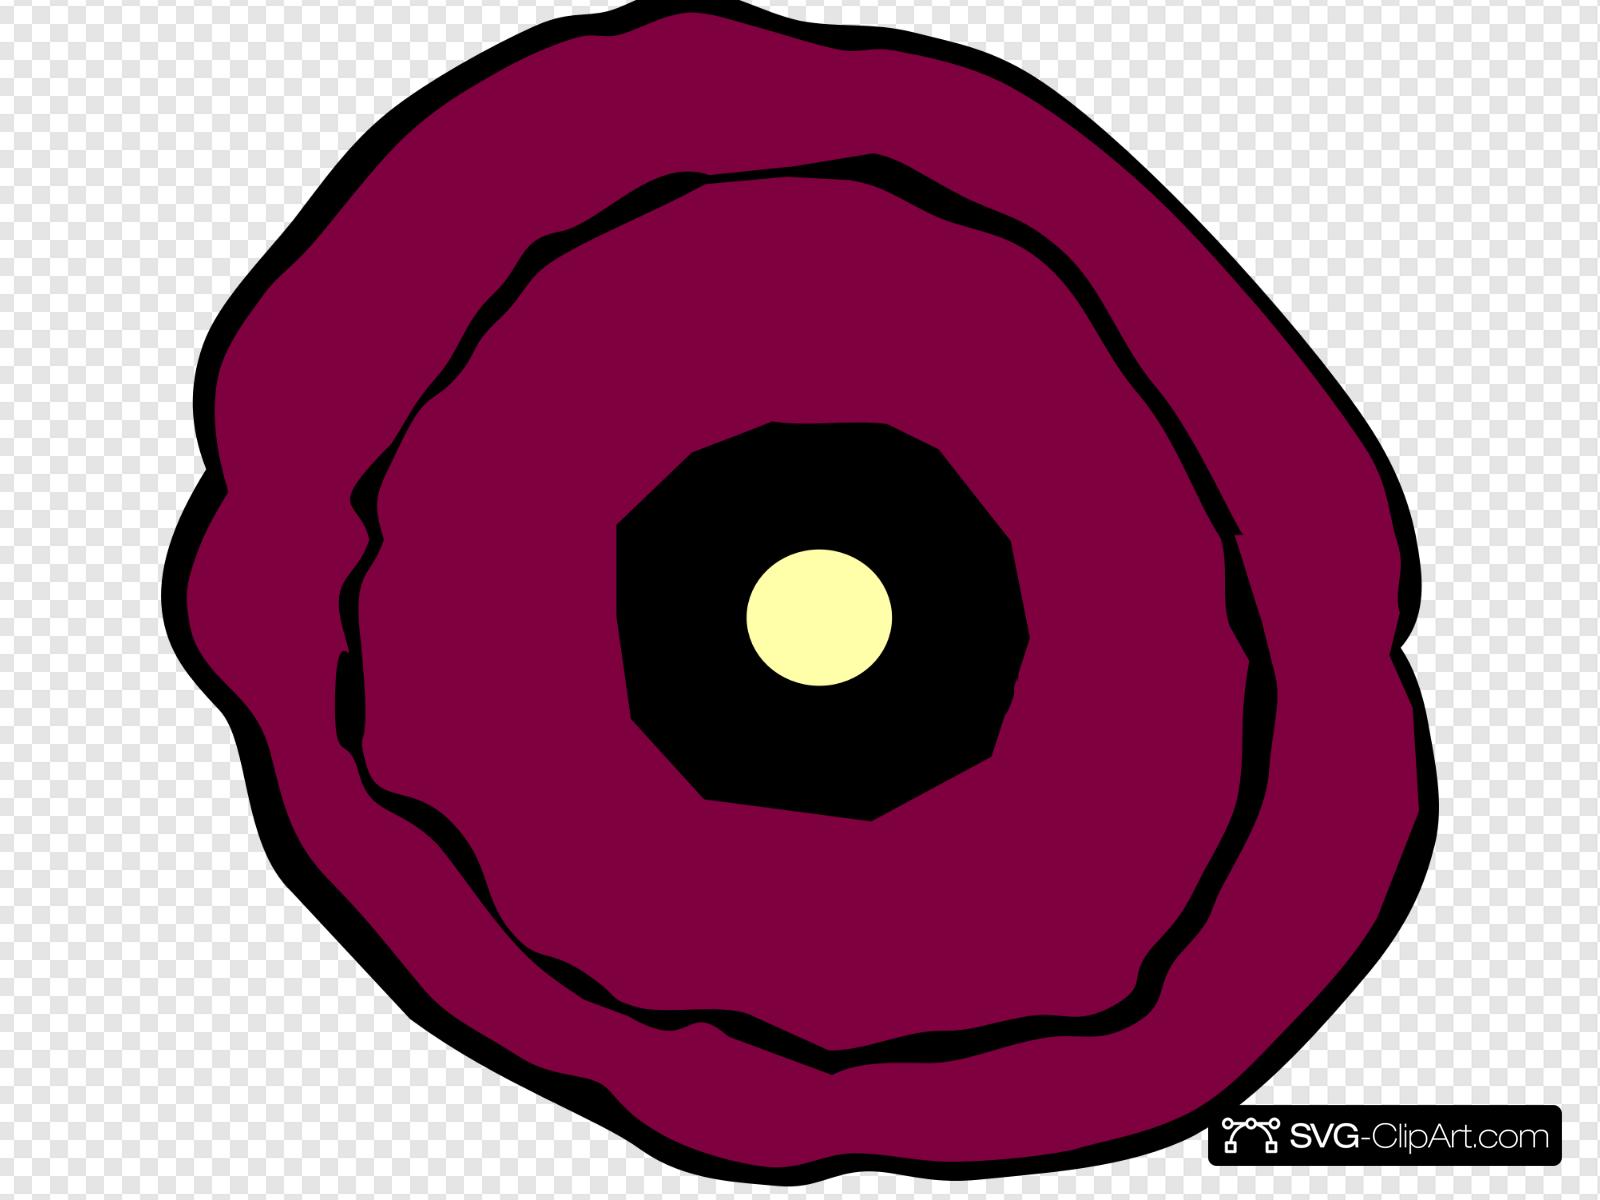 Poppy clipart svg. New layered clip art